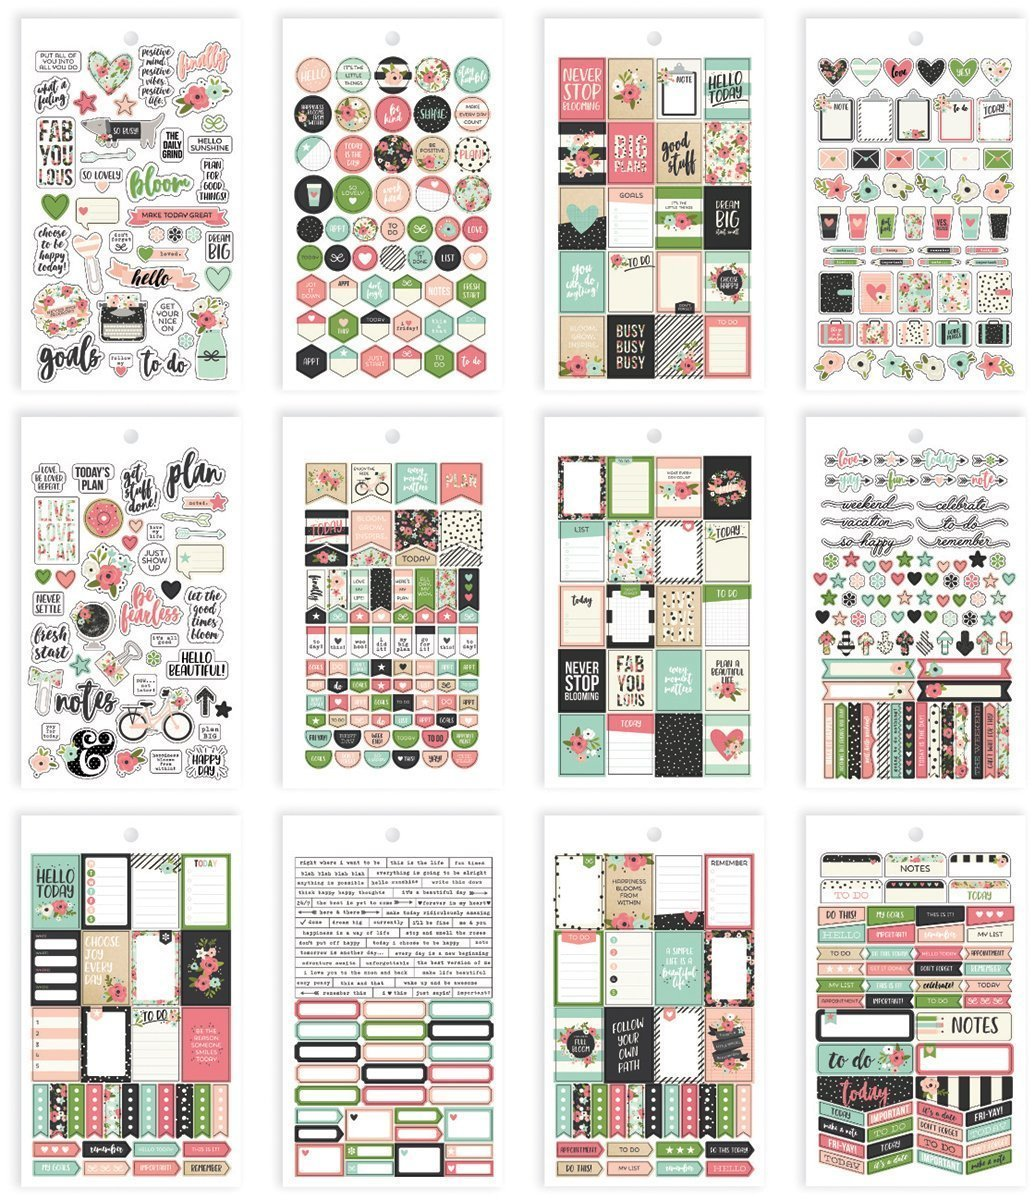 Carpe Diem Fun Design Bloom Mini Sticker Tablet Simple Stories 7993